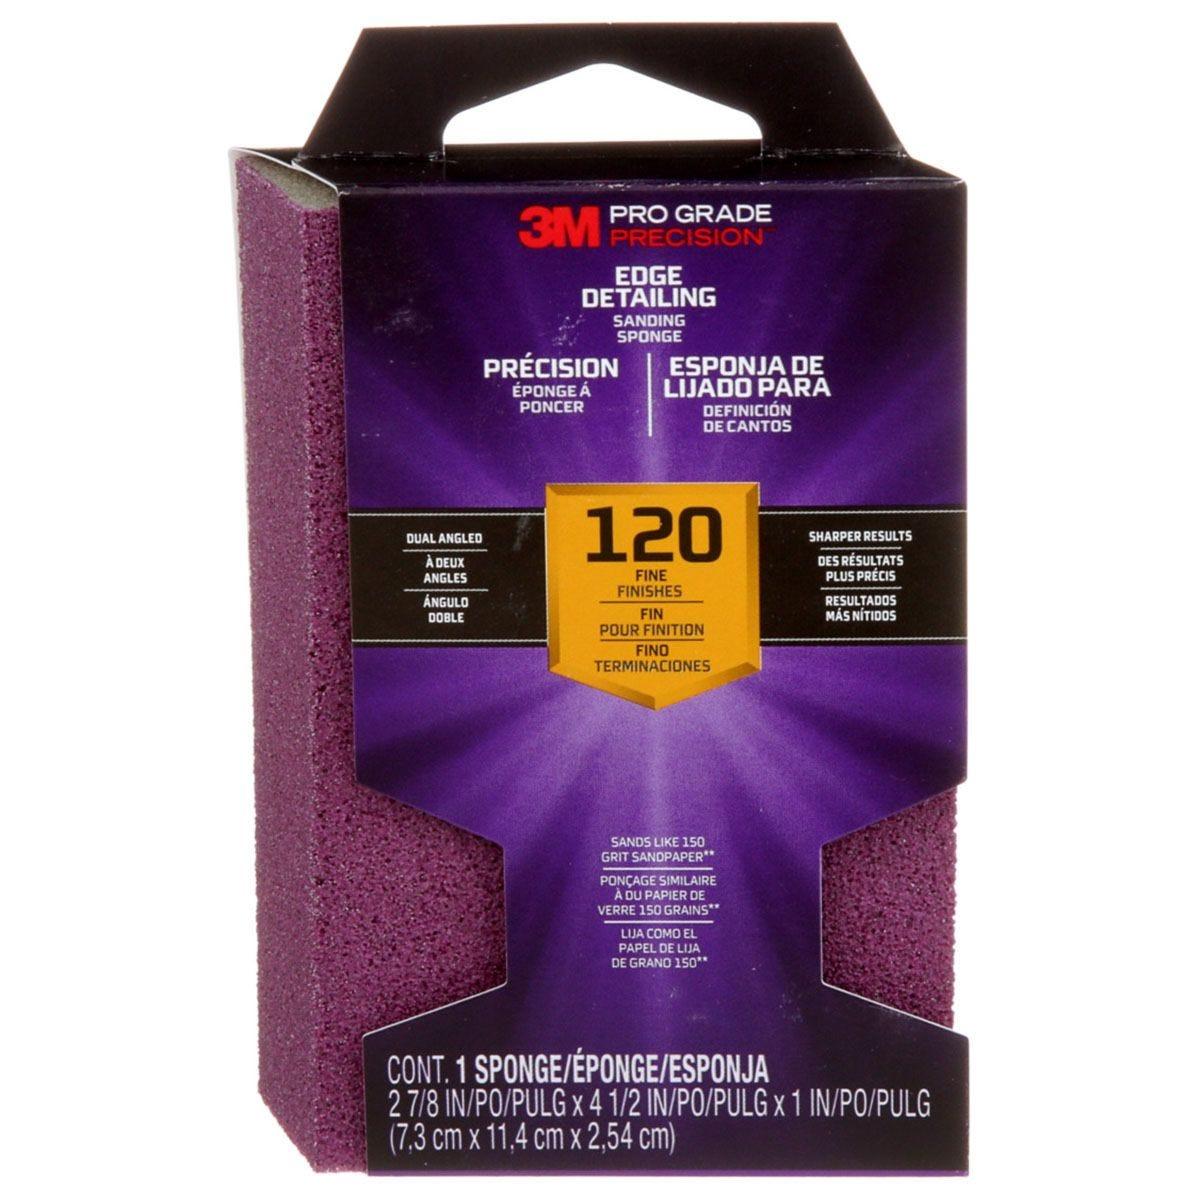 3M(TM) Pro Grade Precision(TM) Edge Detailing Dual Angle Sanding Sponge 120 Grit - Purple